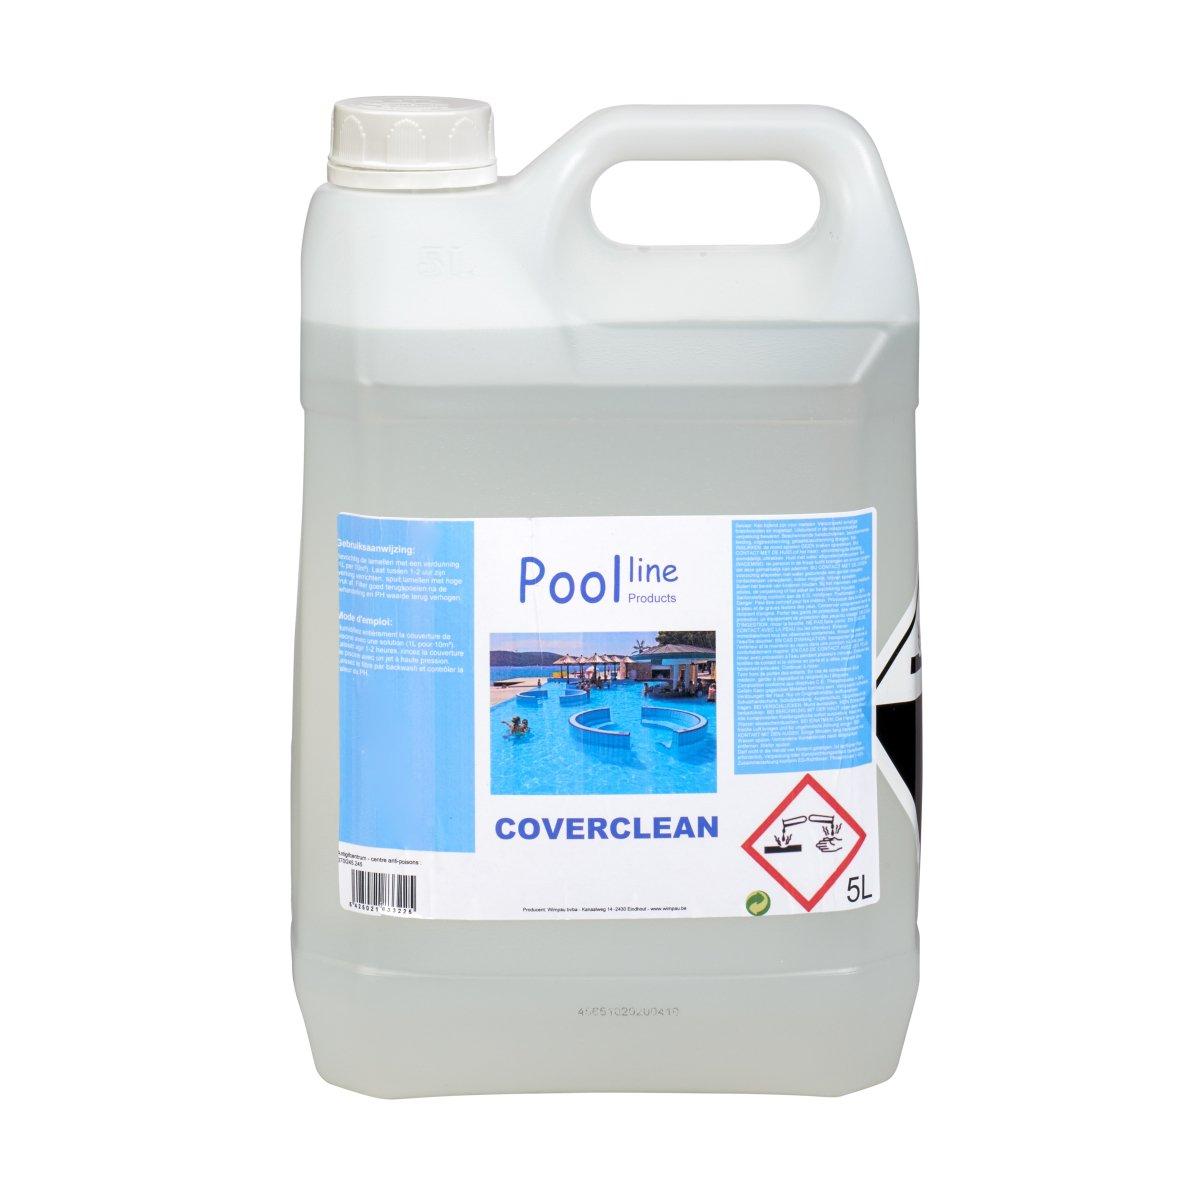 Poolline Coverclean 5L